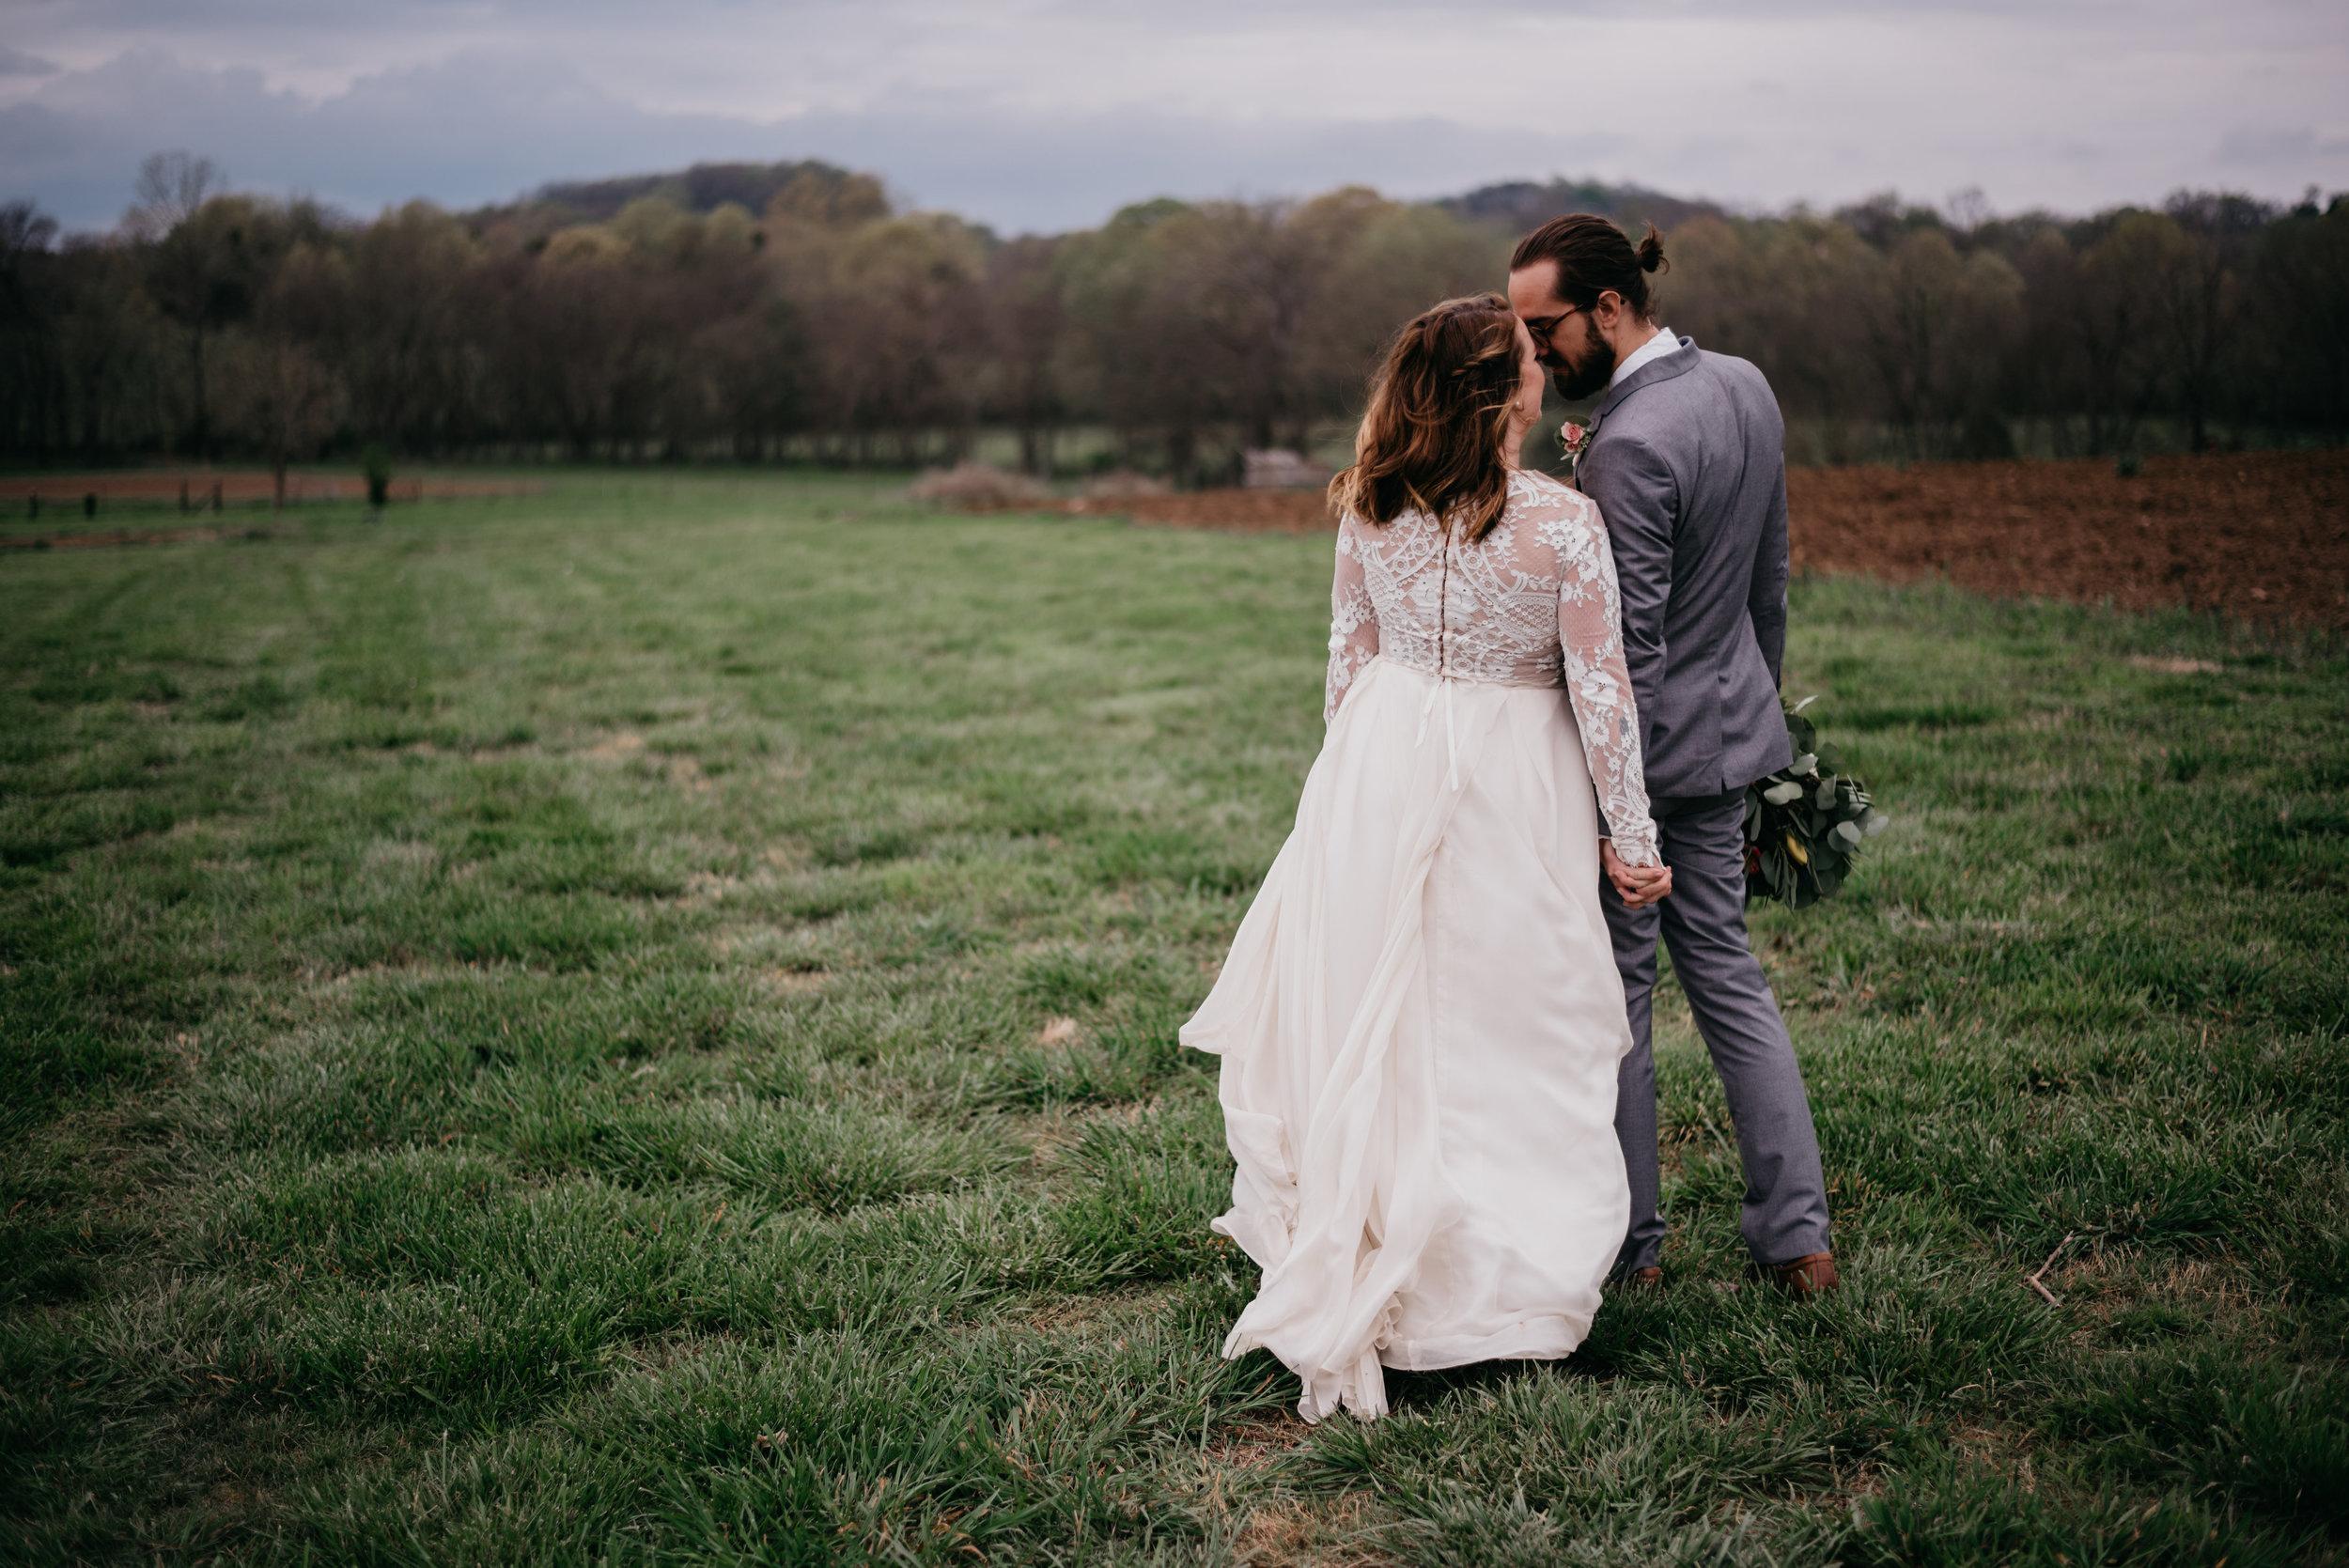 Allenbrooke-Farms-Nashville-Wedding-Photographers 32.jpg